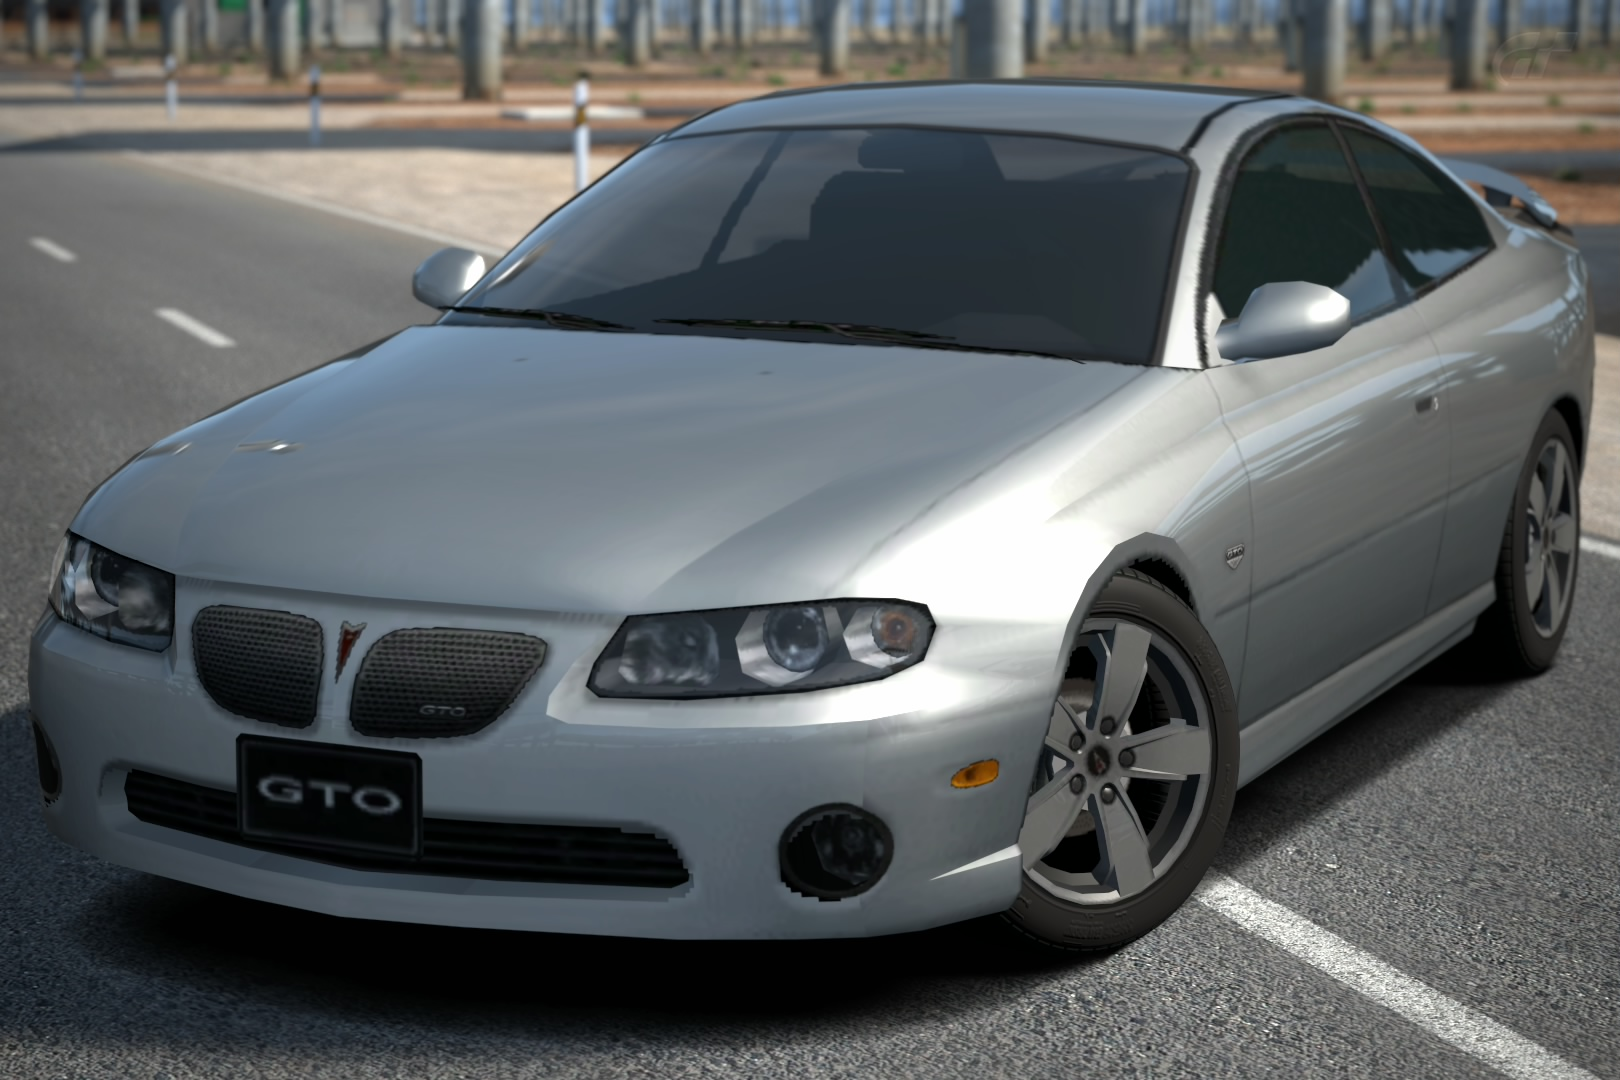 Pontiac Gto 5 7 Coupe 04 Gran Turismo Wiki Fandom